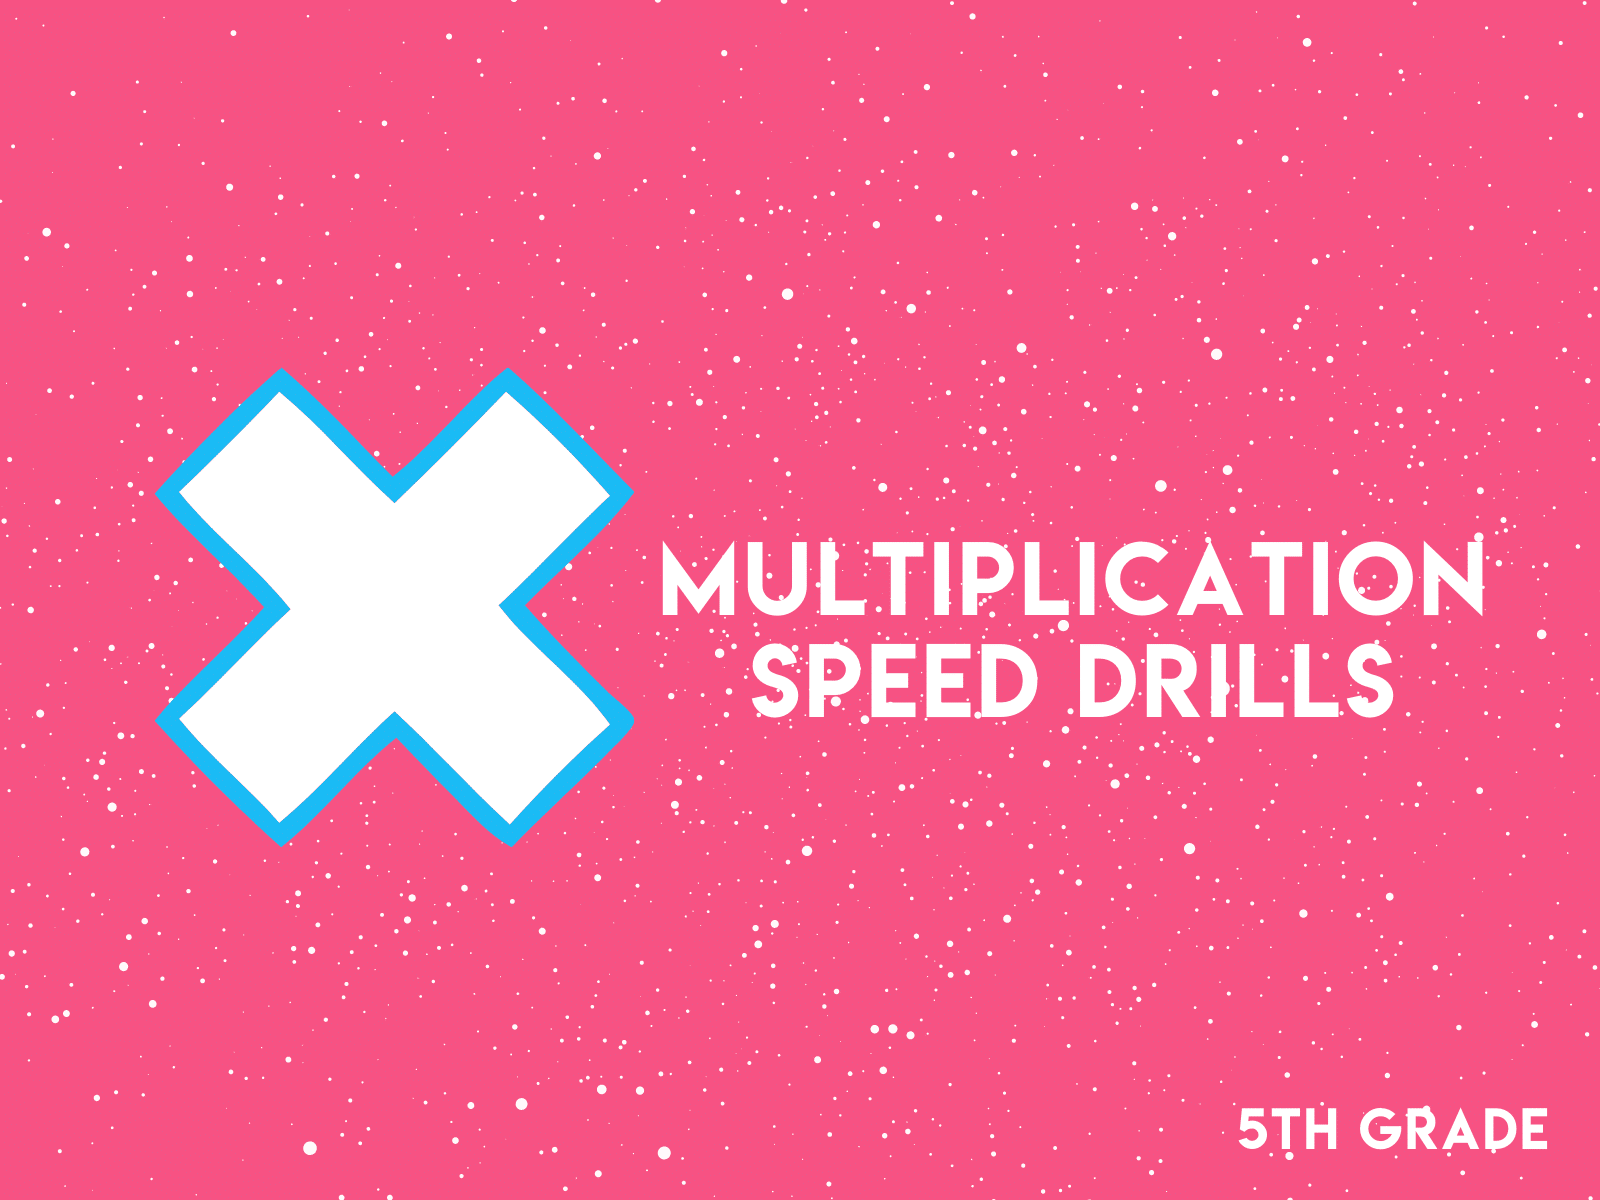 Multiplication speed drills   5th grade math practice worksheets